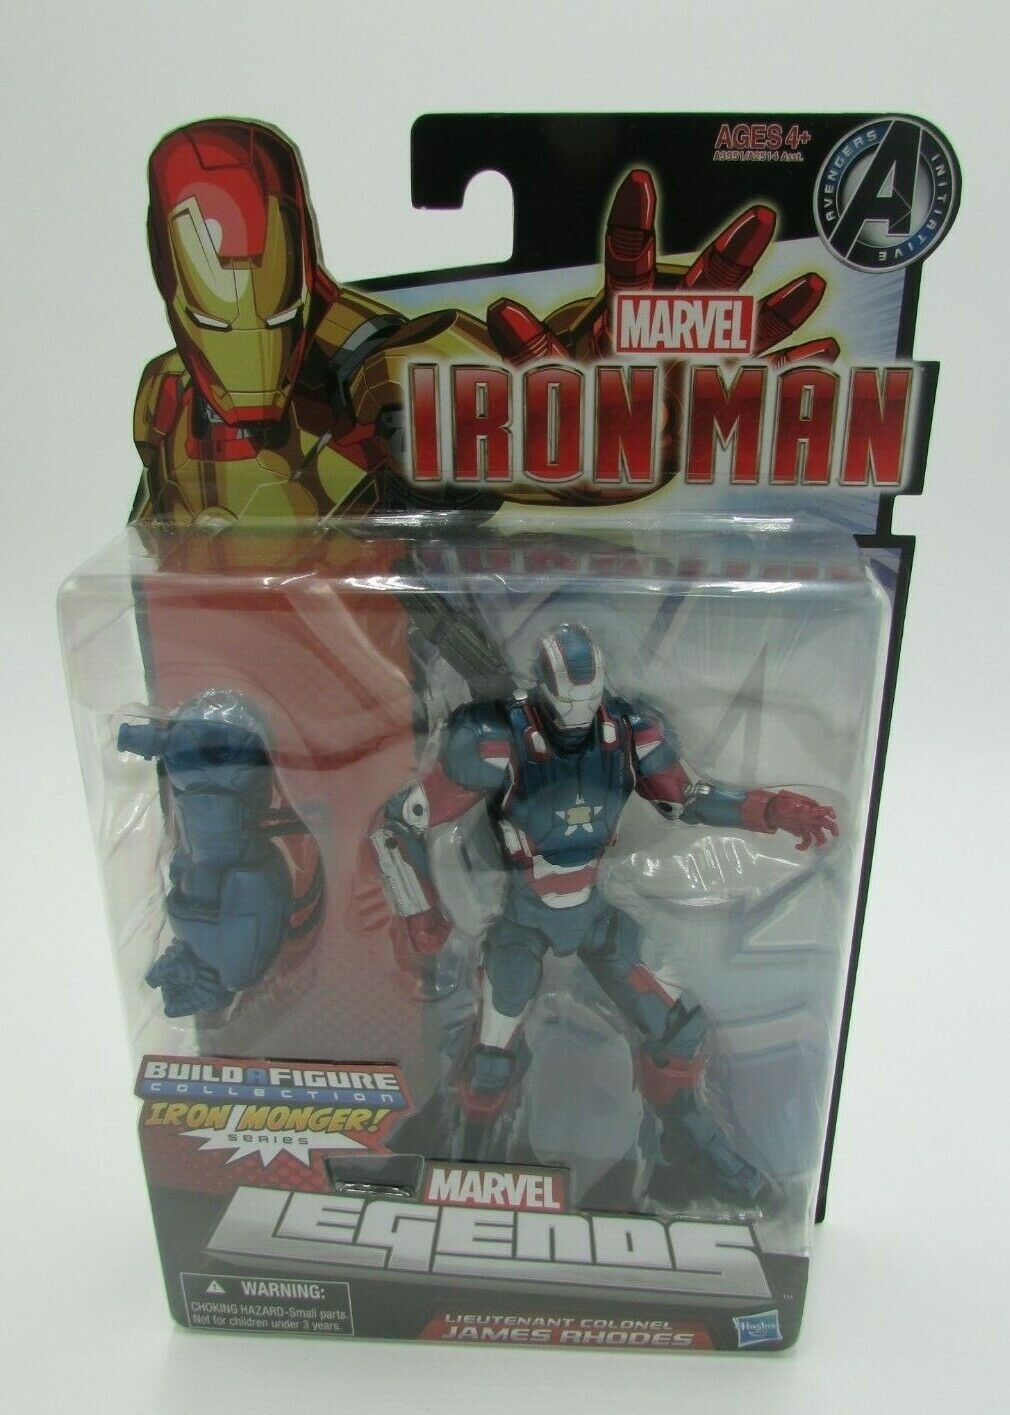 Marvel leggende Iron uomo Iron Patriot James Rhodes BAF IRON MONGER Nuovo di Zecca 2012